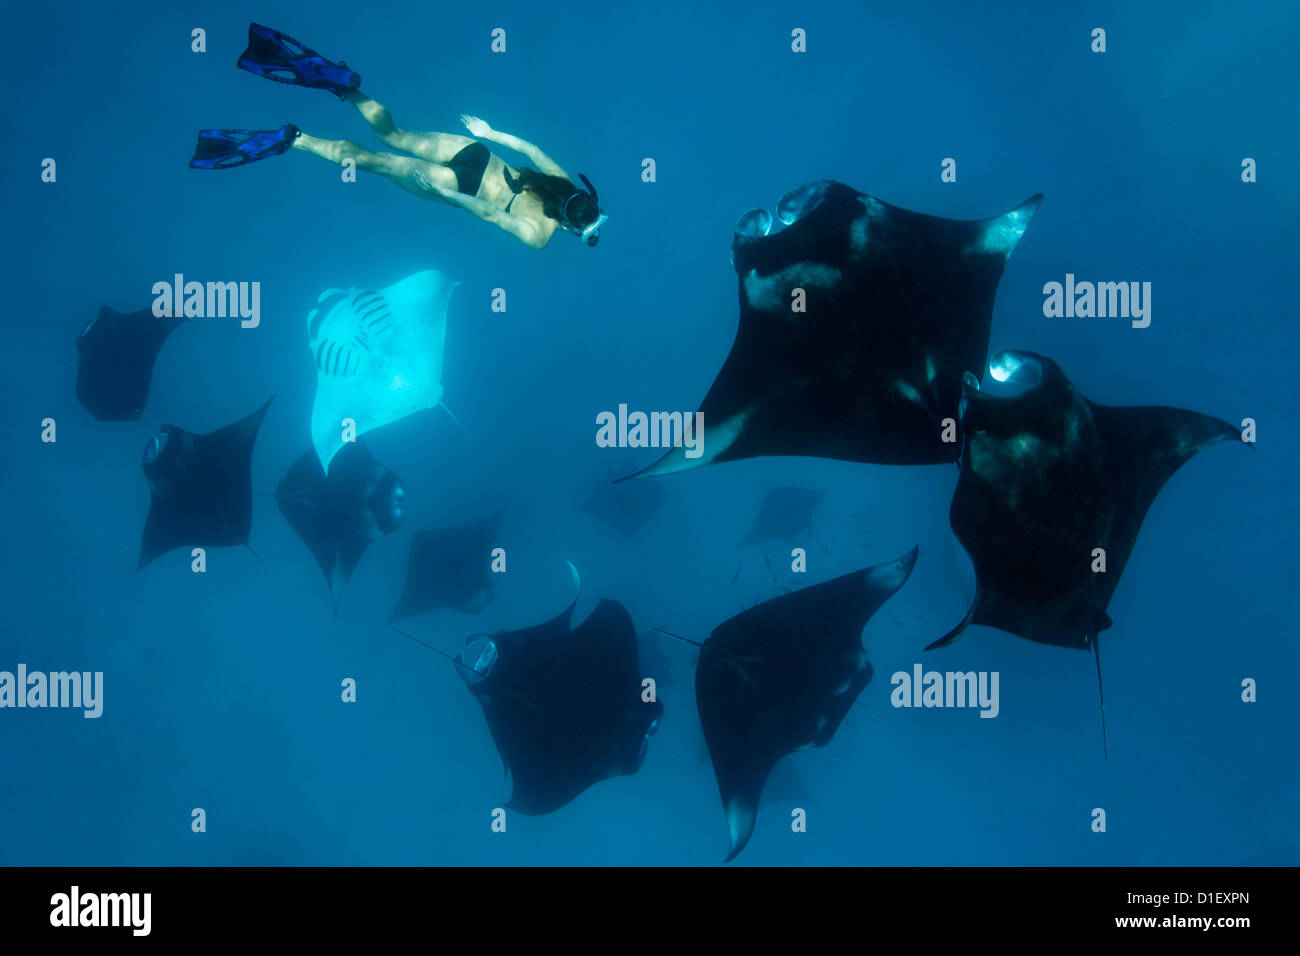 Woman with group of reef mantas (Manta alfredi), Baa Atoll, Maldives, Indian Ocean, underwater shot - Stock Image